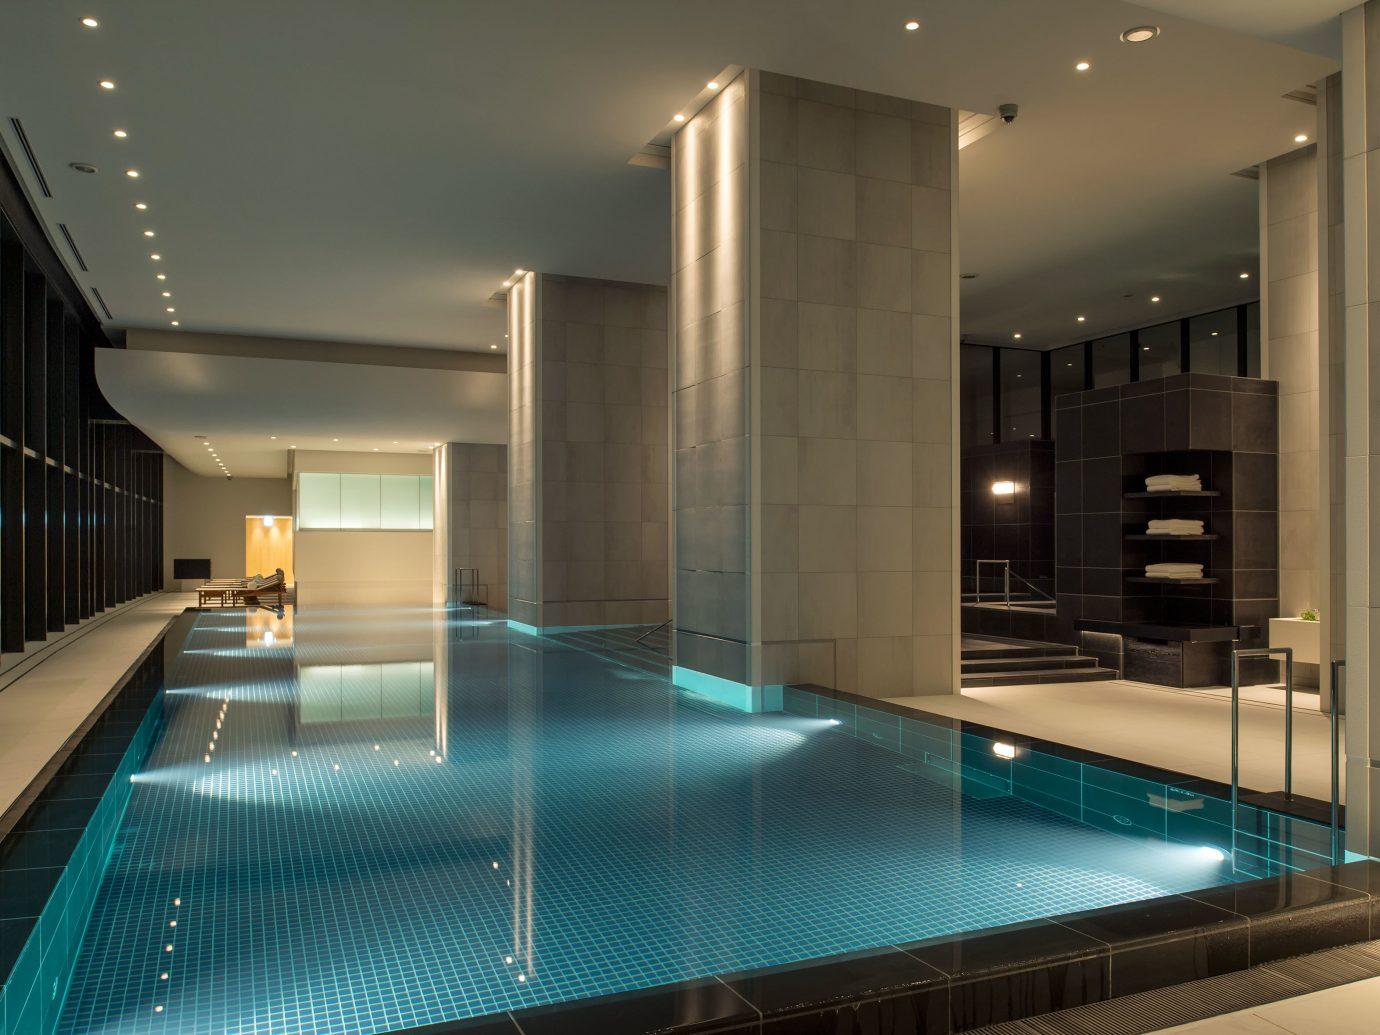 Hotels Japan Tokyo indoor wall ceiling swimming pool room floor interior design lighting daylighting Design condominium Lobby